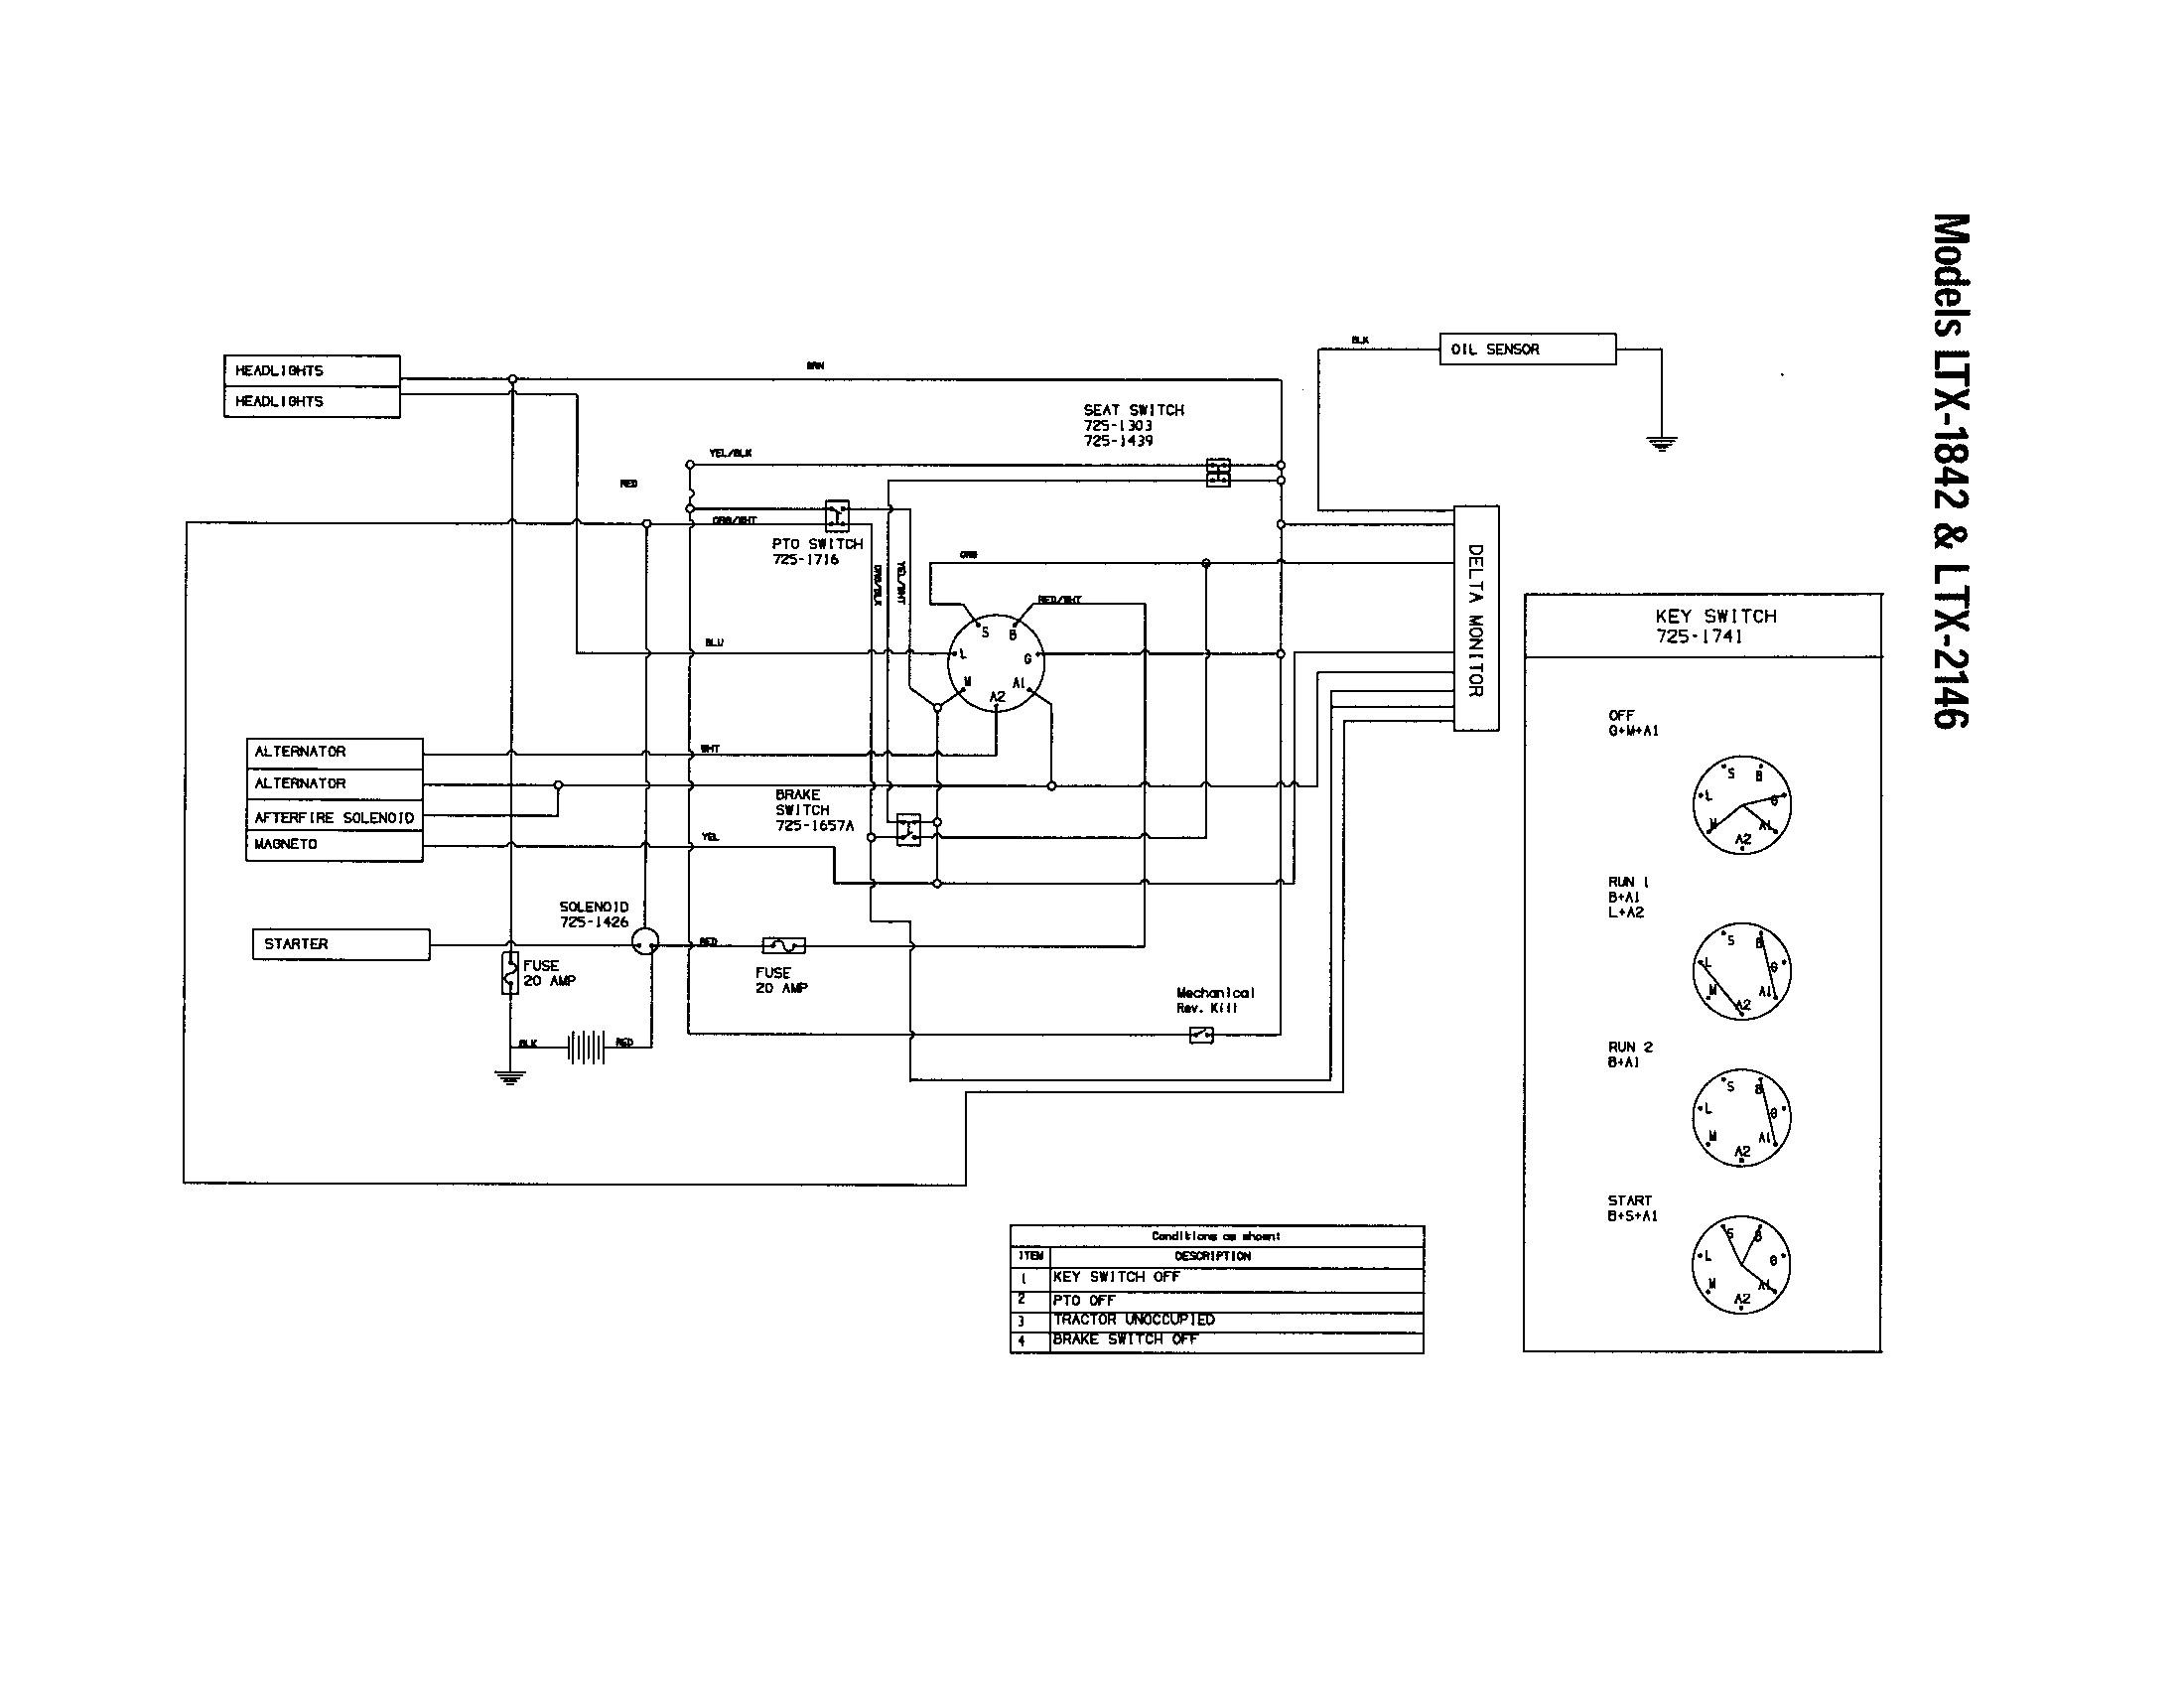 Snapper Ignition Wiring Diagram Rear Engine Riding Mowers Rider Lawn Mower Rh Detoxicrecenze Com Electrical